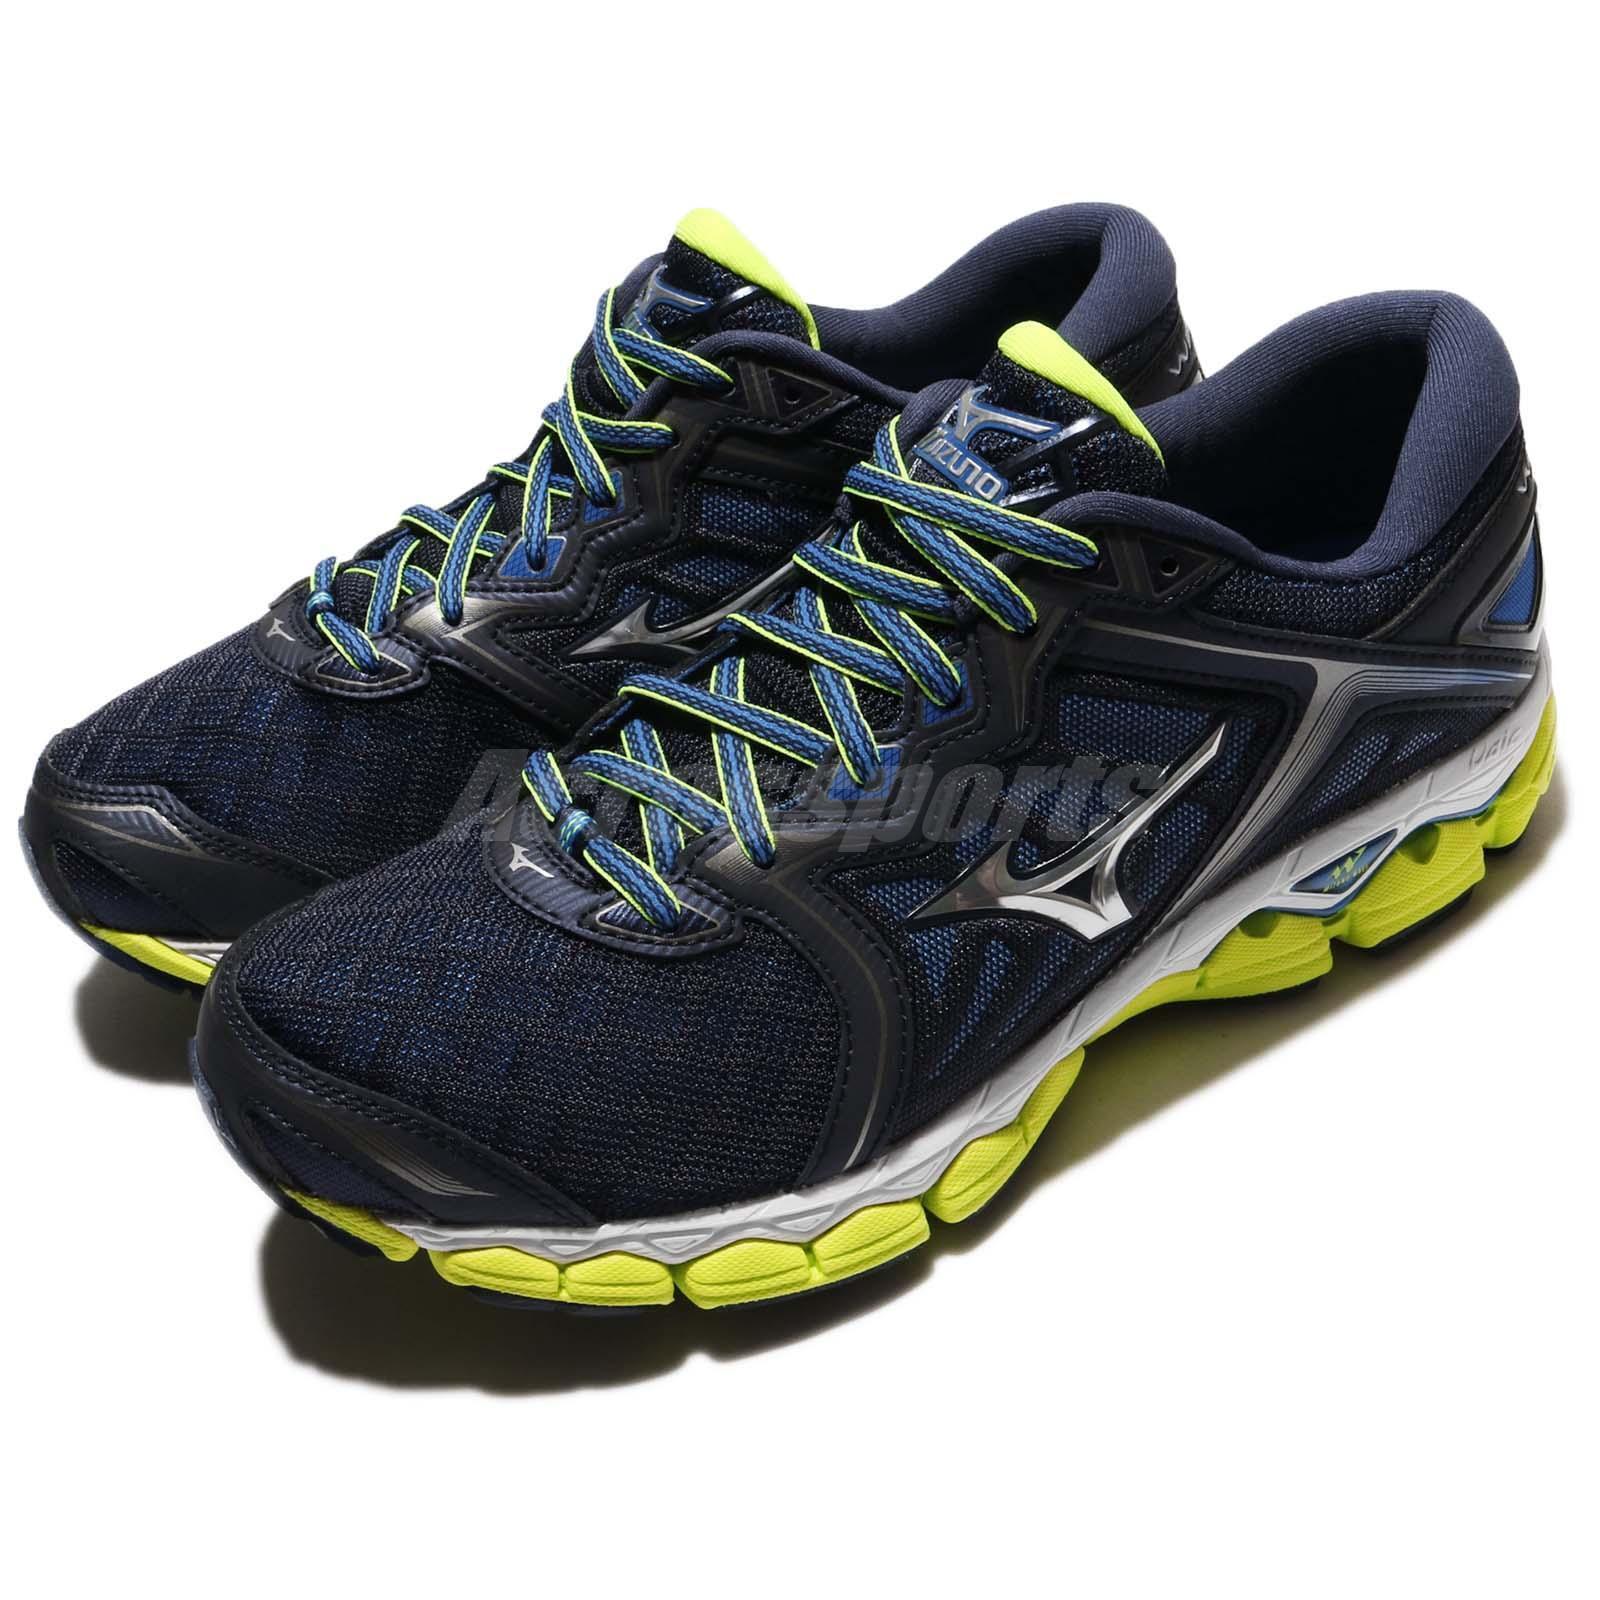 Mizuno  Wave Sky 2E Wide Navy Yellow Men Running shoes Sneakers J1GC17-1105  general high quality